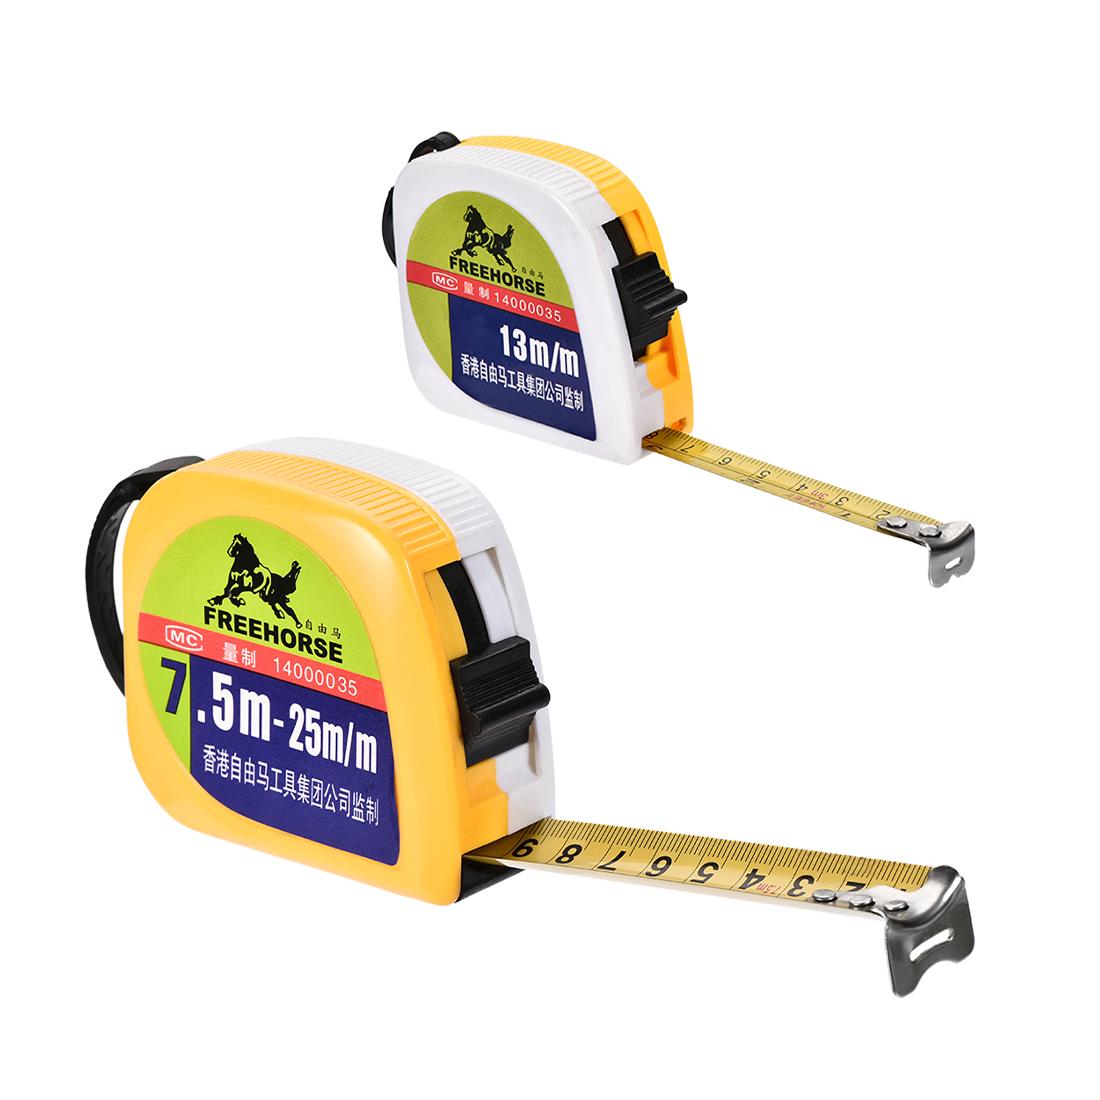 Tape Measure 3 M 7.5 M 10 Ft 25 Ft Retractable Metric Round Case 2 in 1 Set